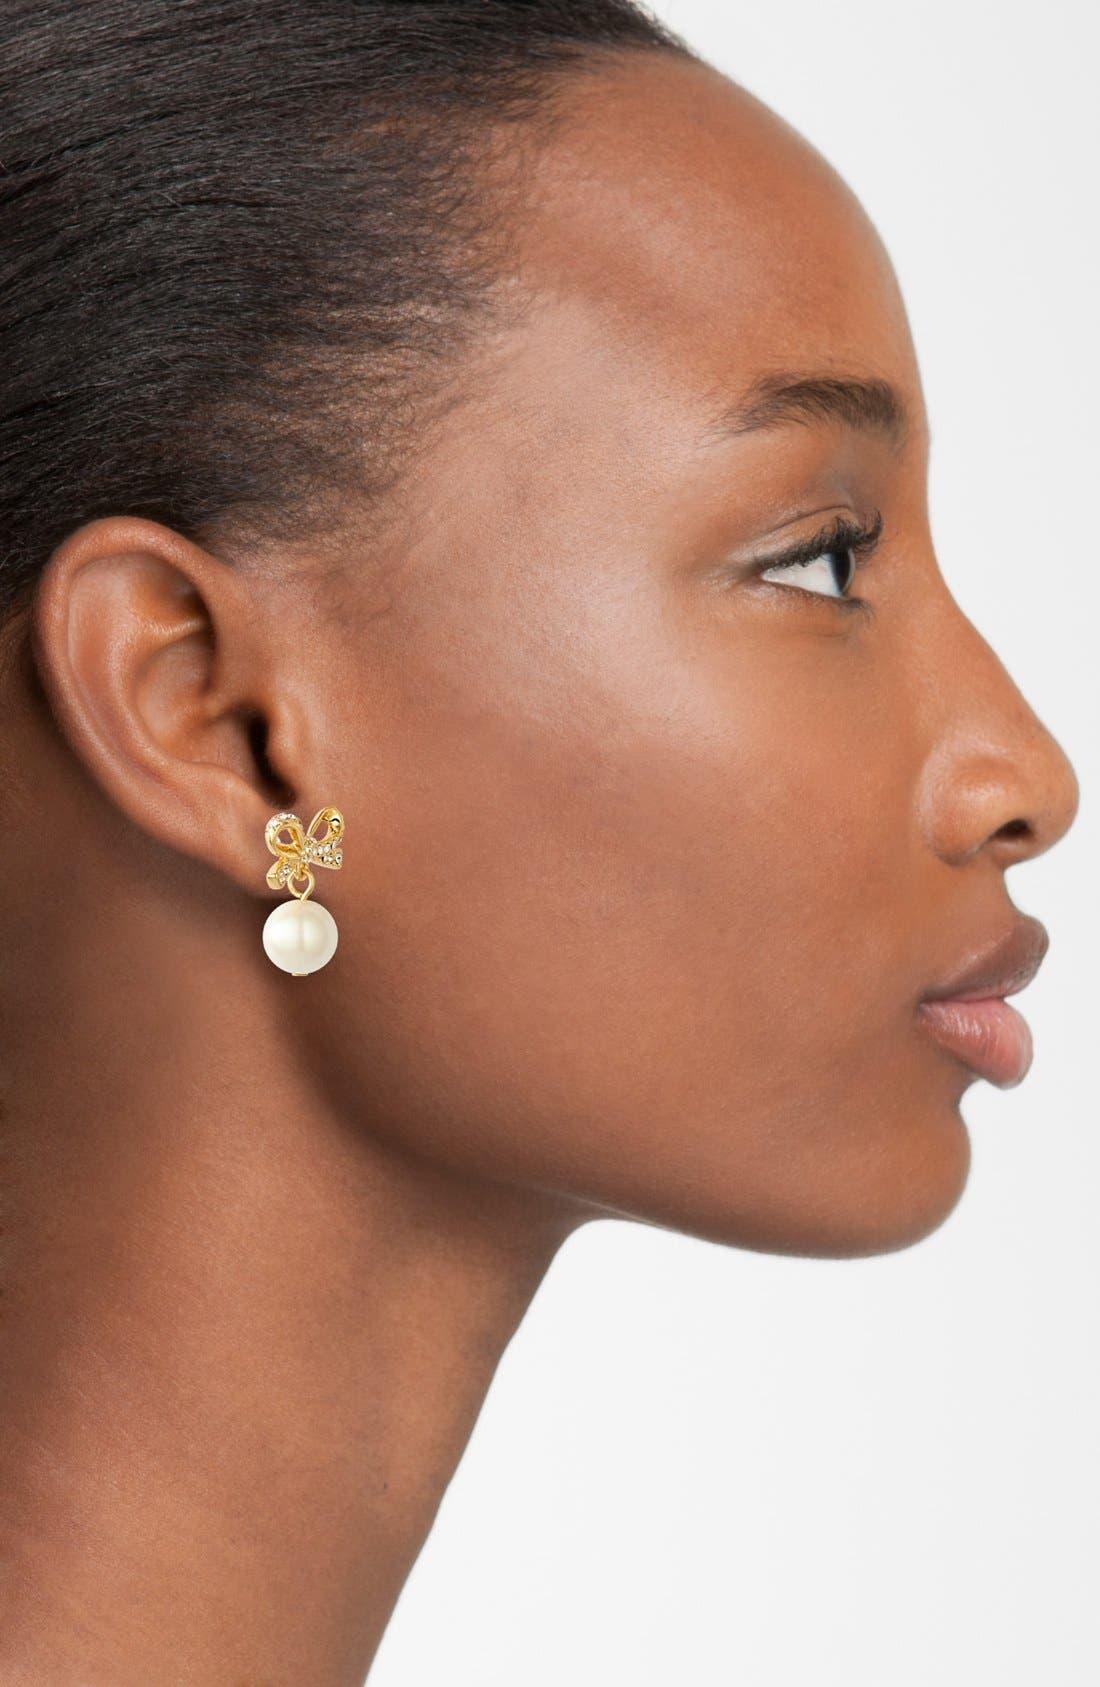 KATE SPADE NEW YORK,                             'skinny mini' bow drop earrings,                             Alternate thumbnail 2, color,                             142